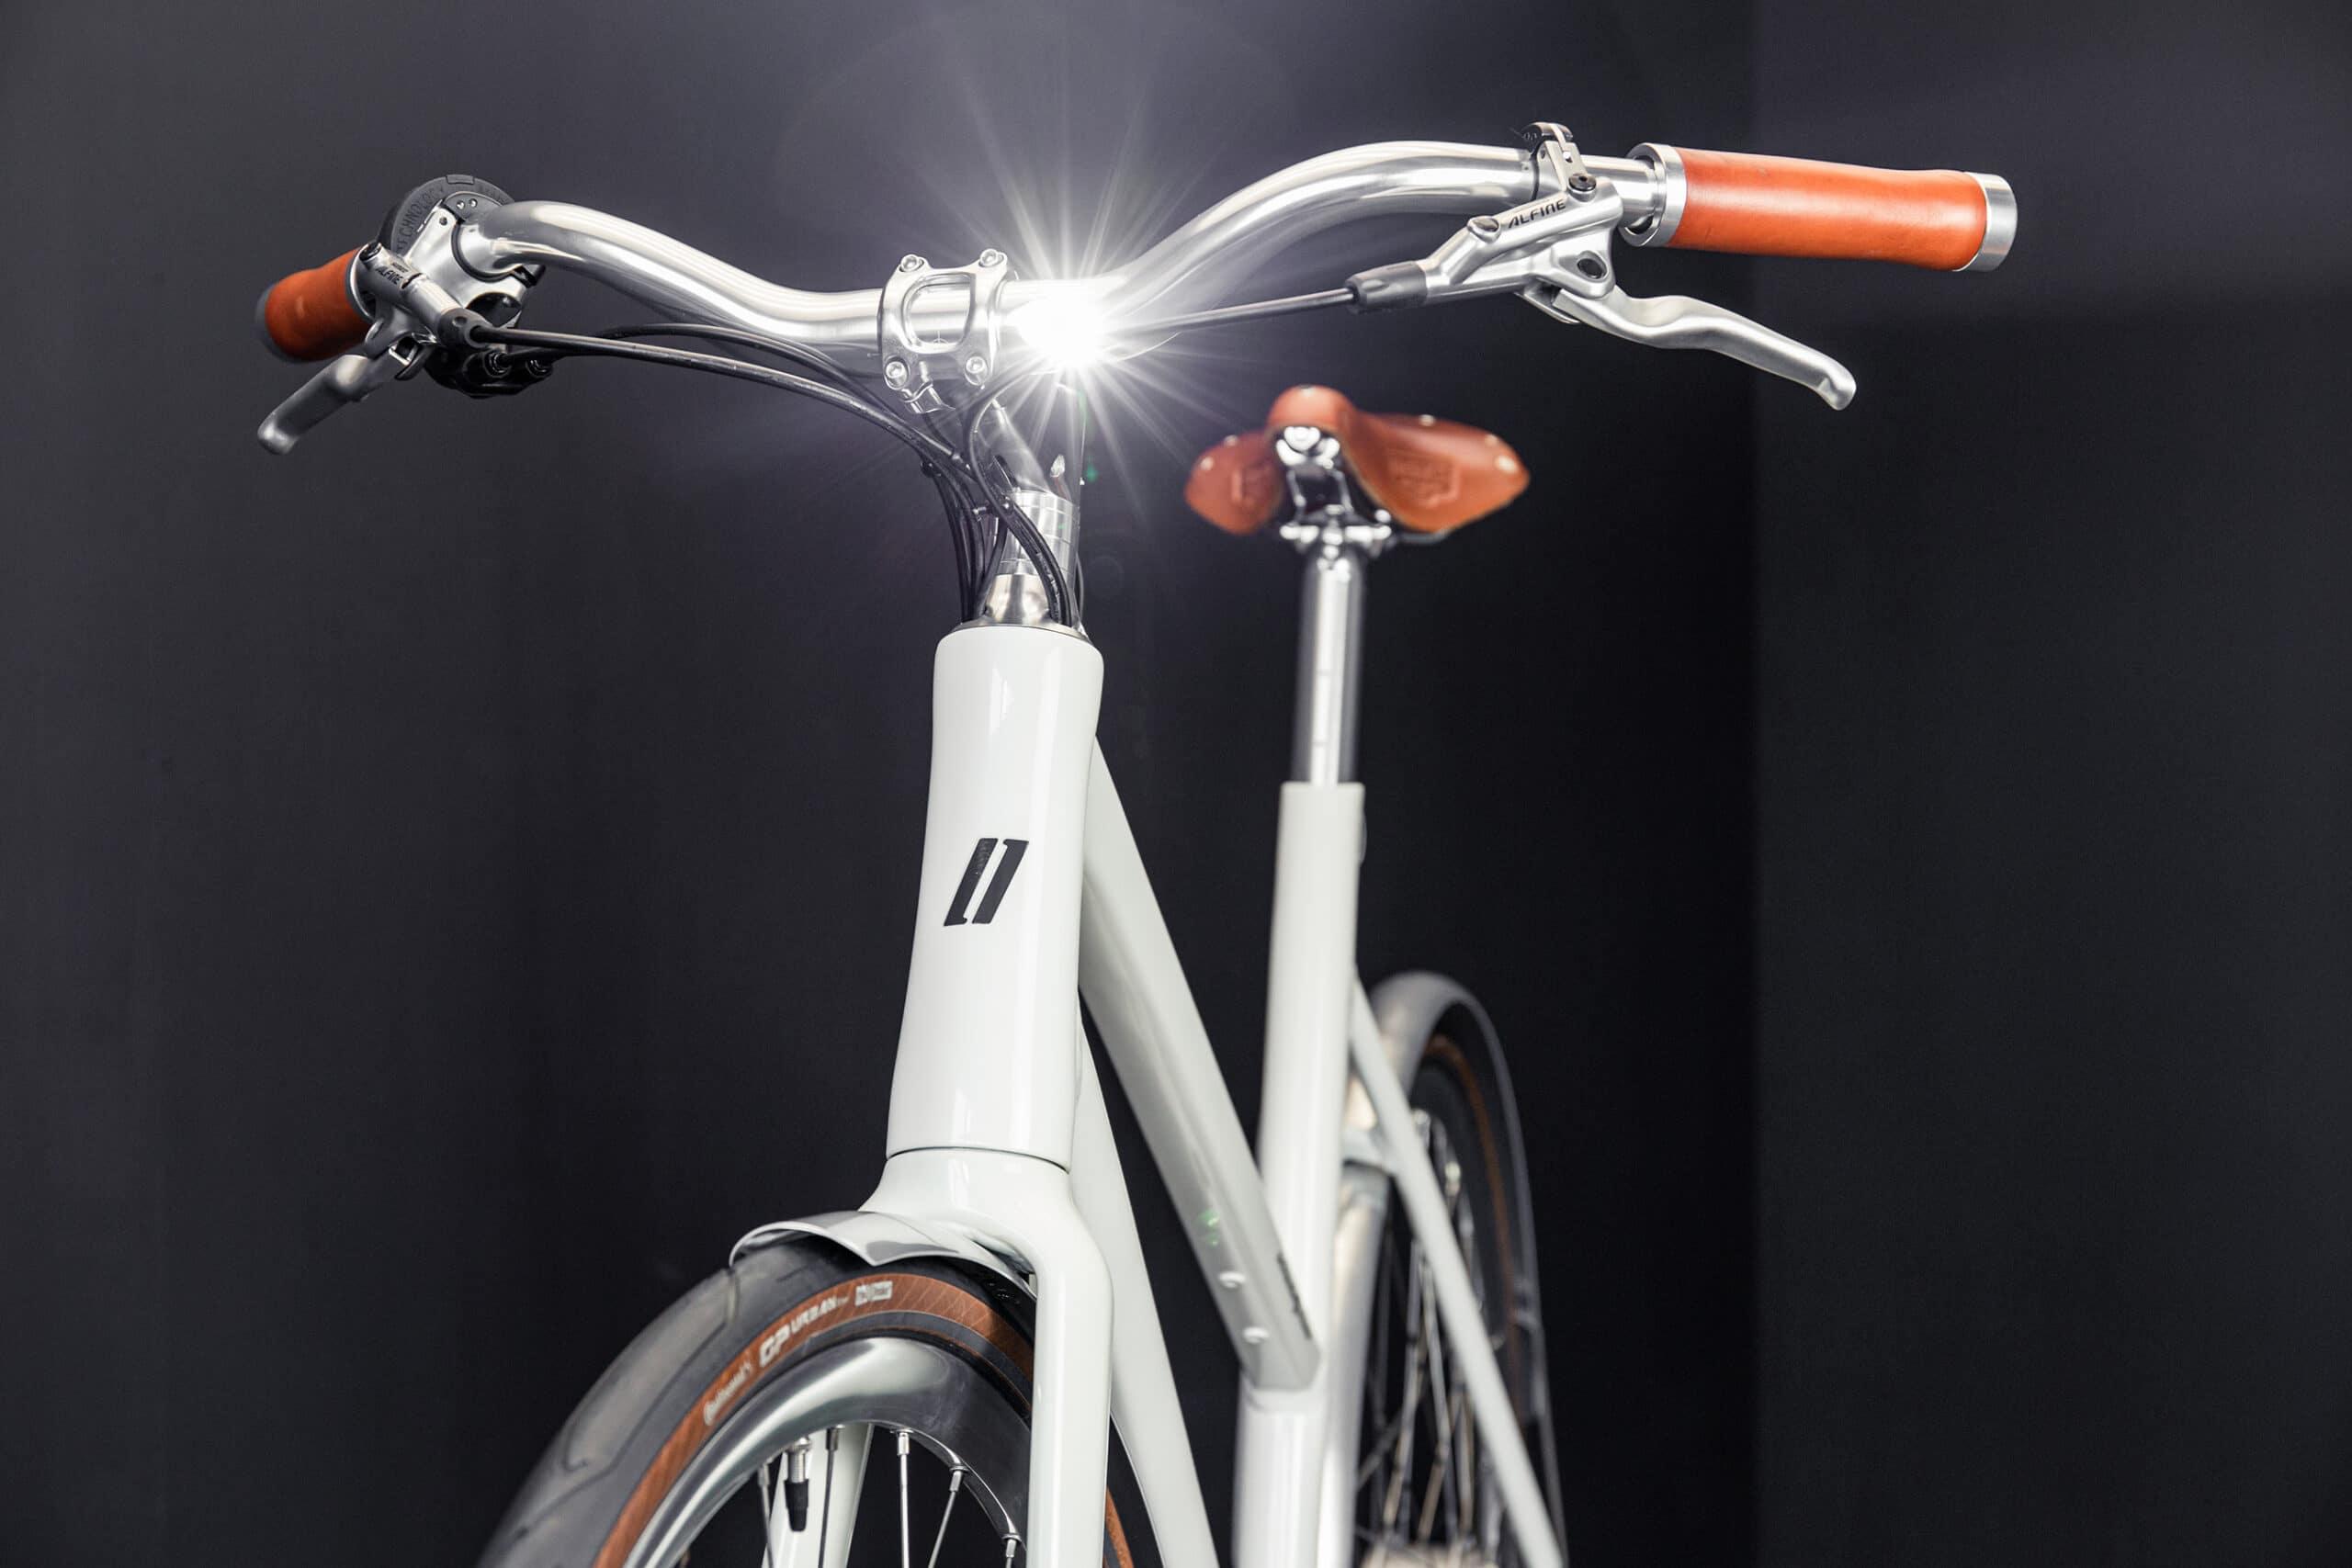 schindelhauer Antonia Pinion e-bike -4